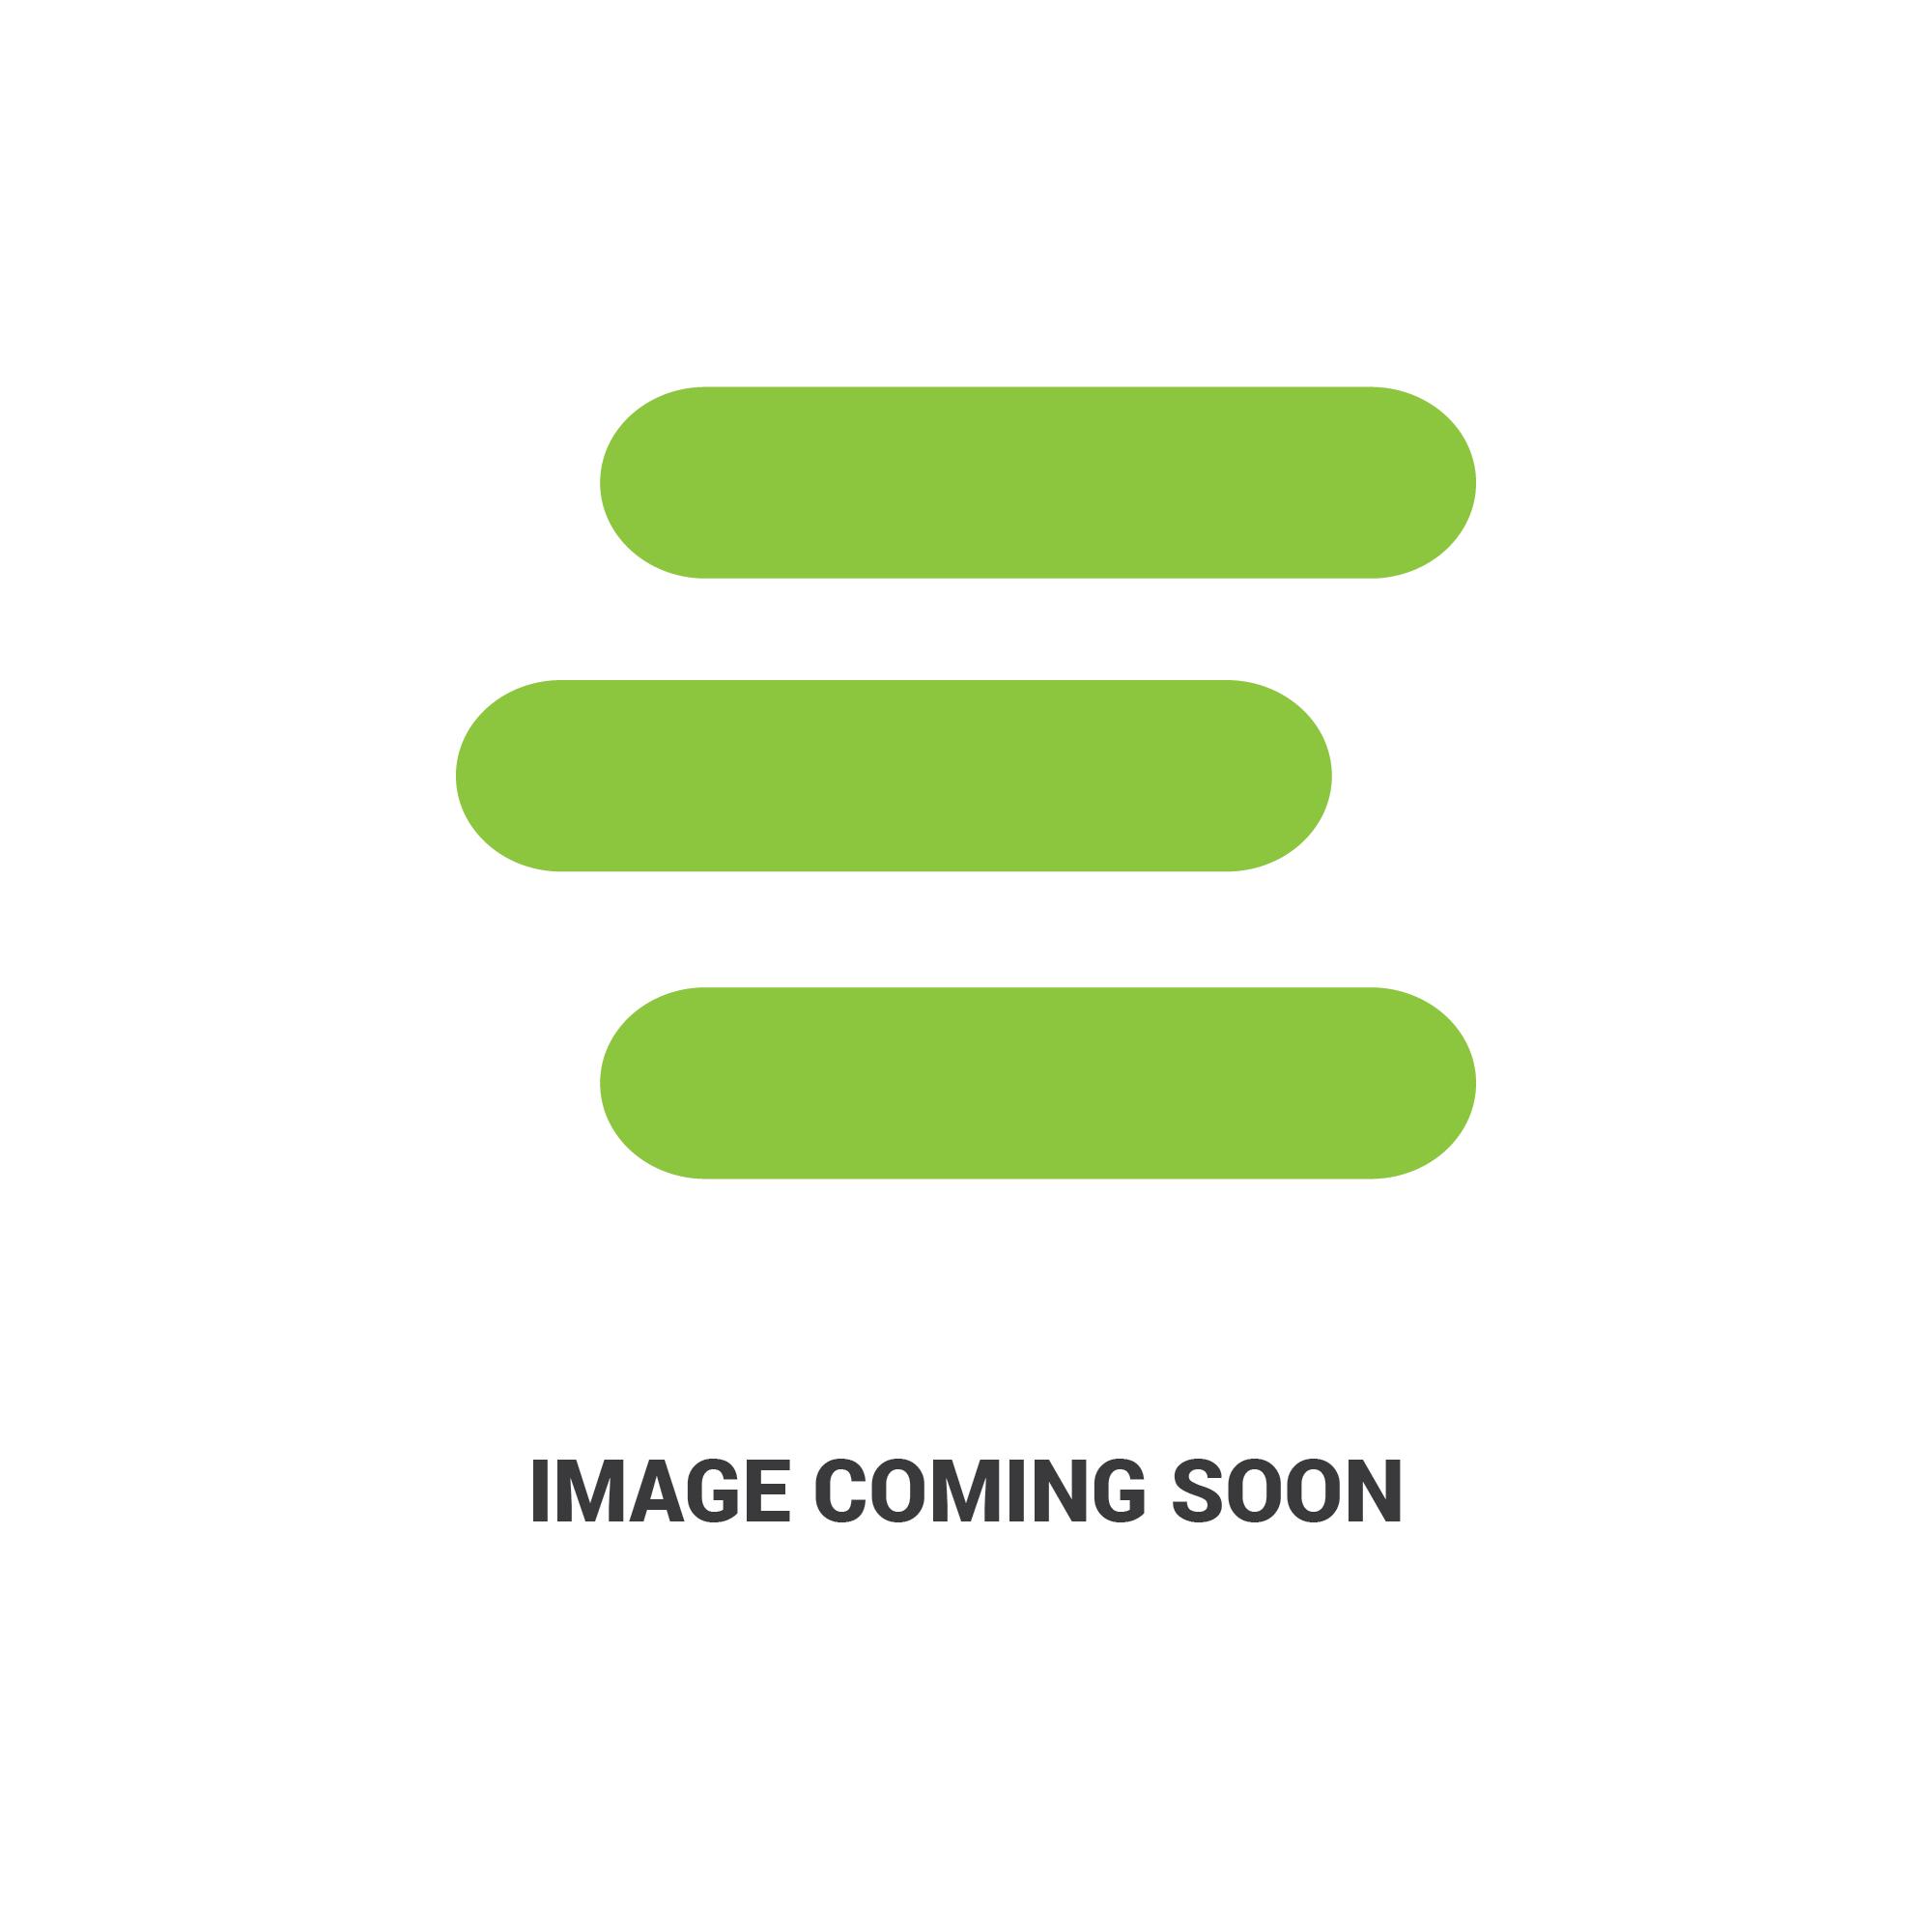 E-66848651237_1.jpg